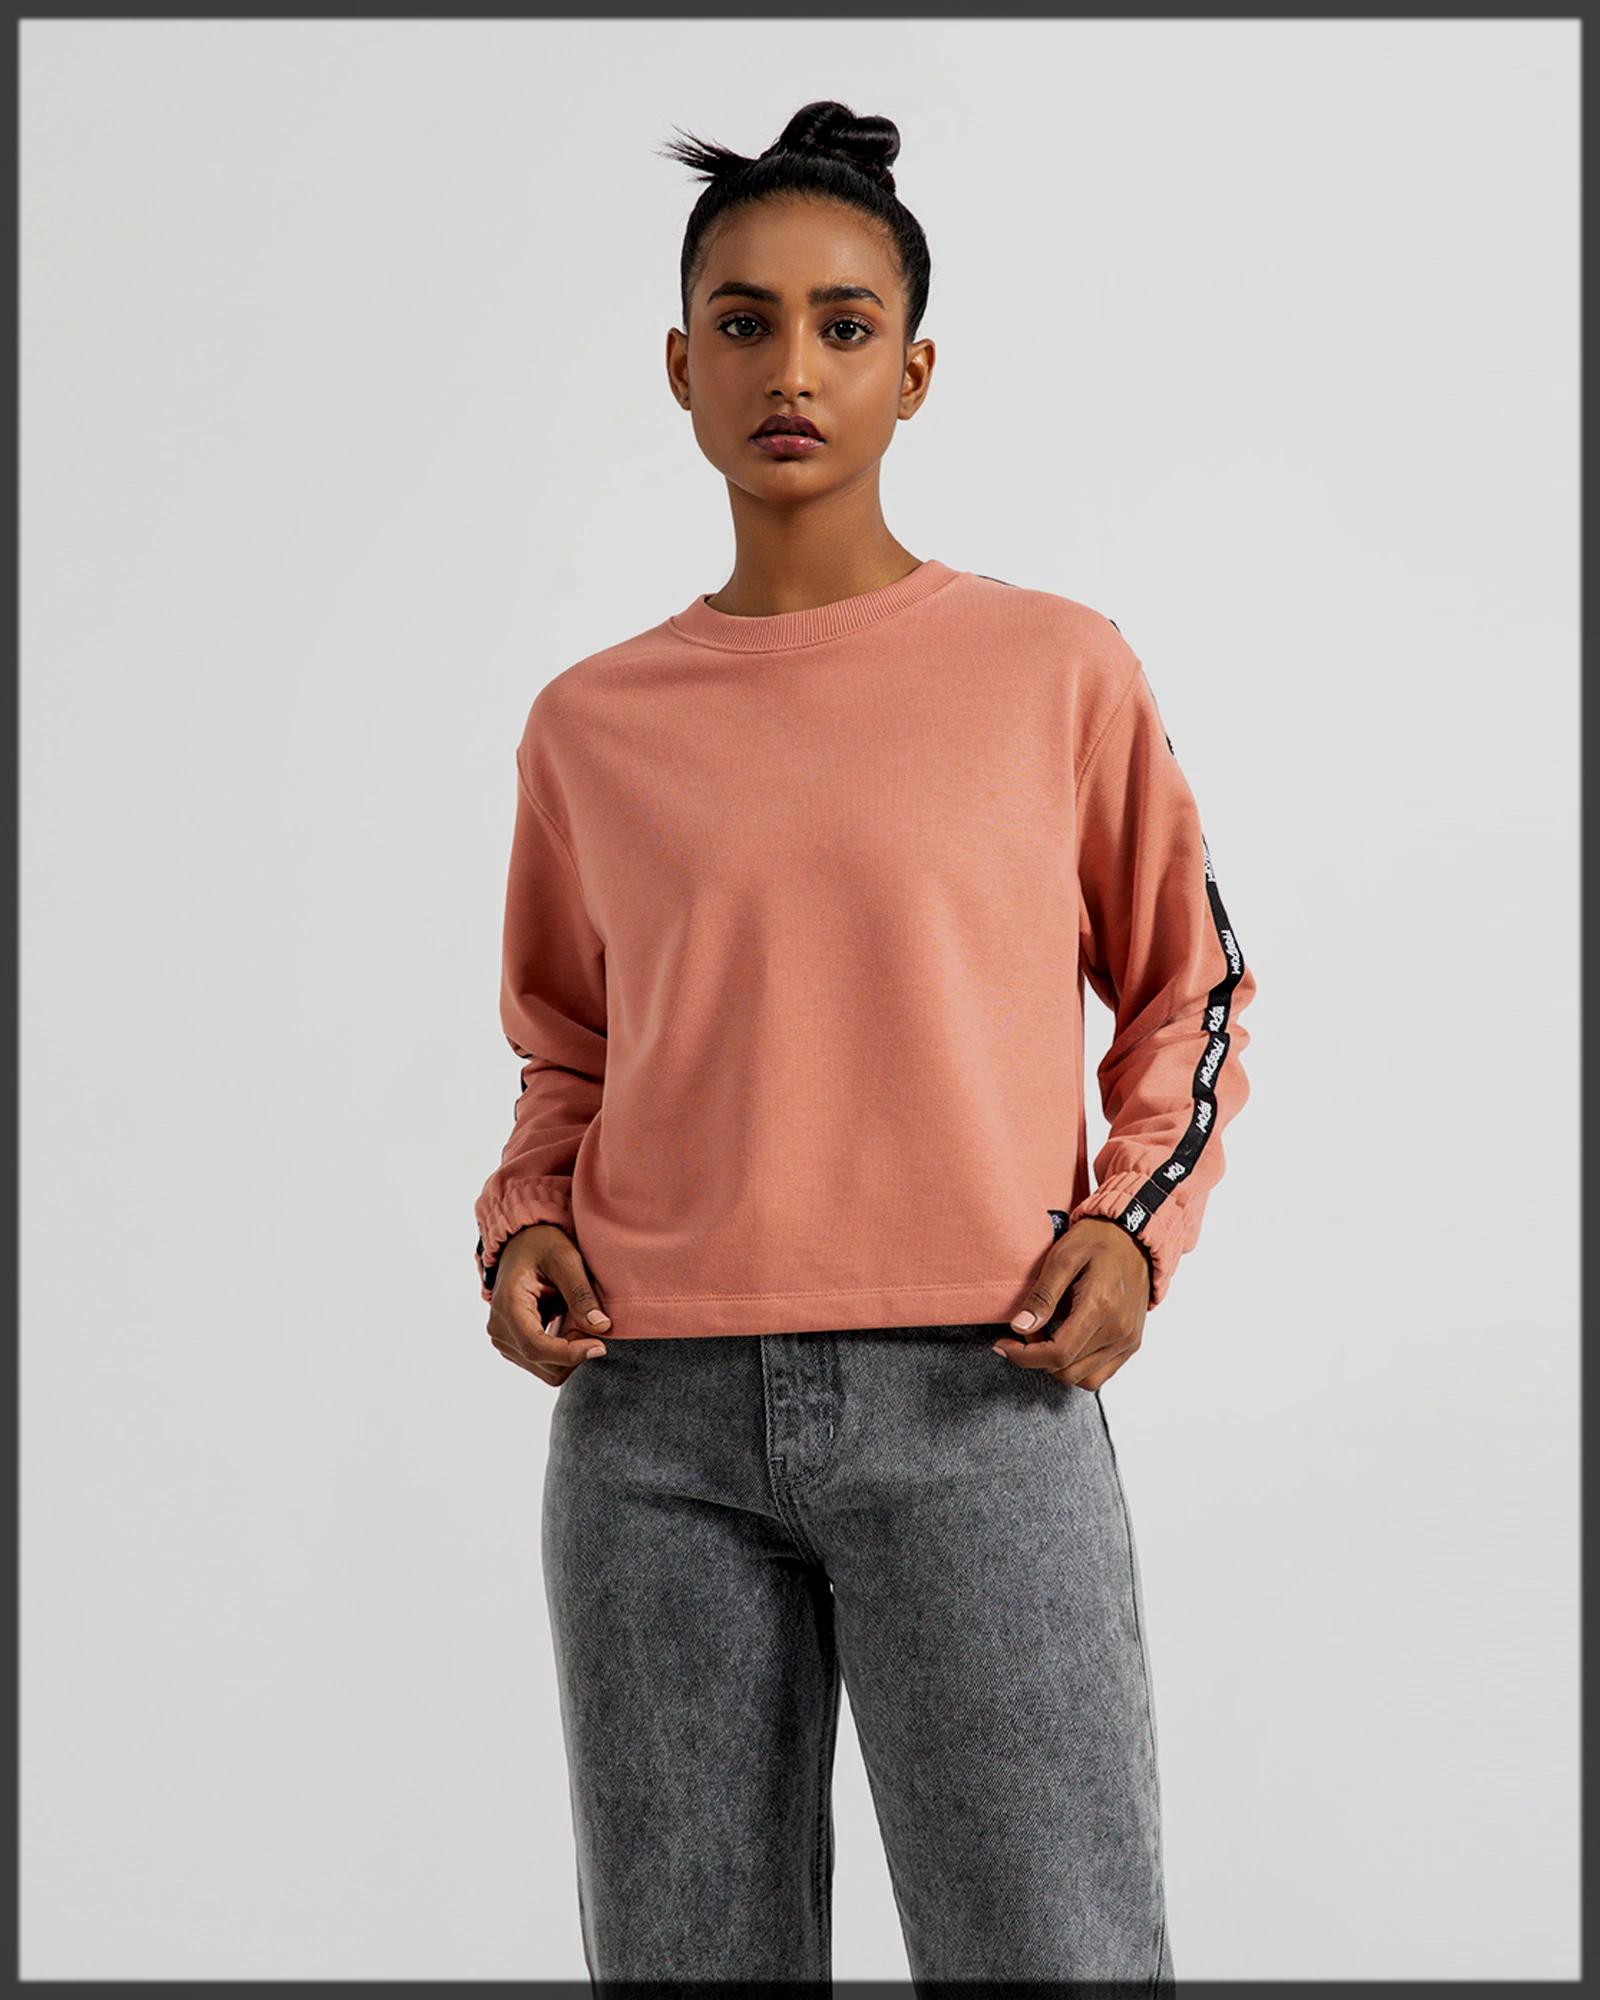 Classy Winter Sweatshirts Collection